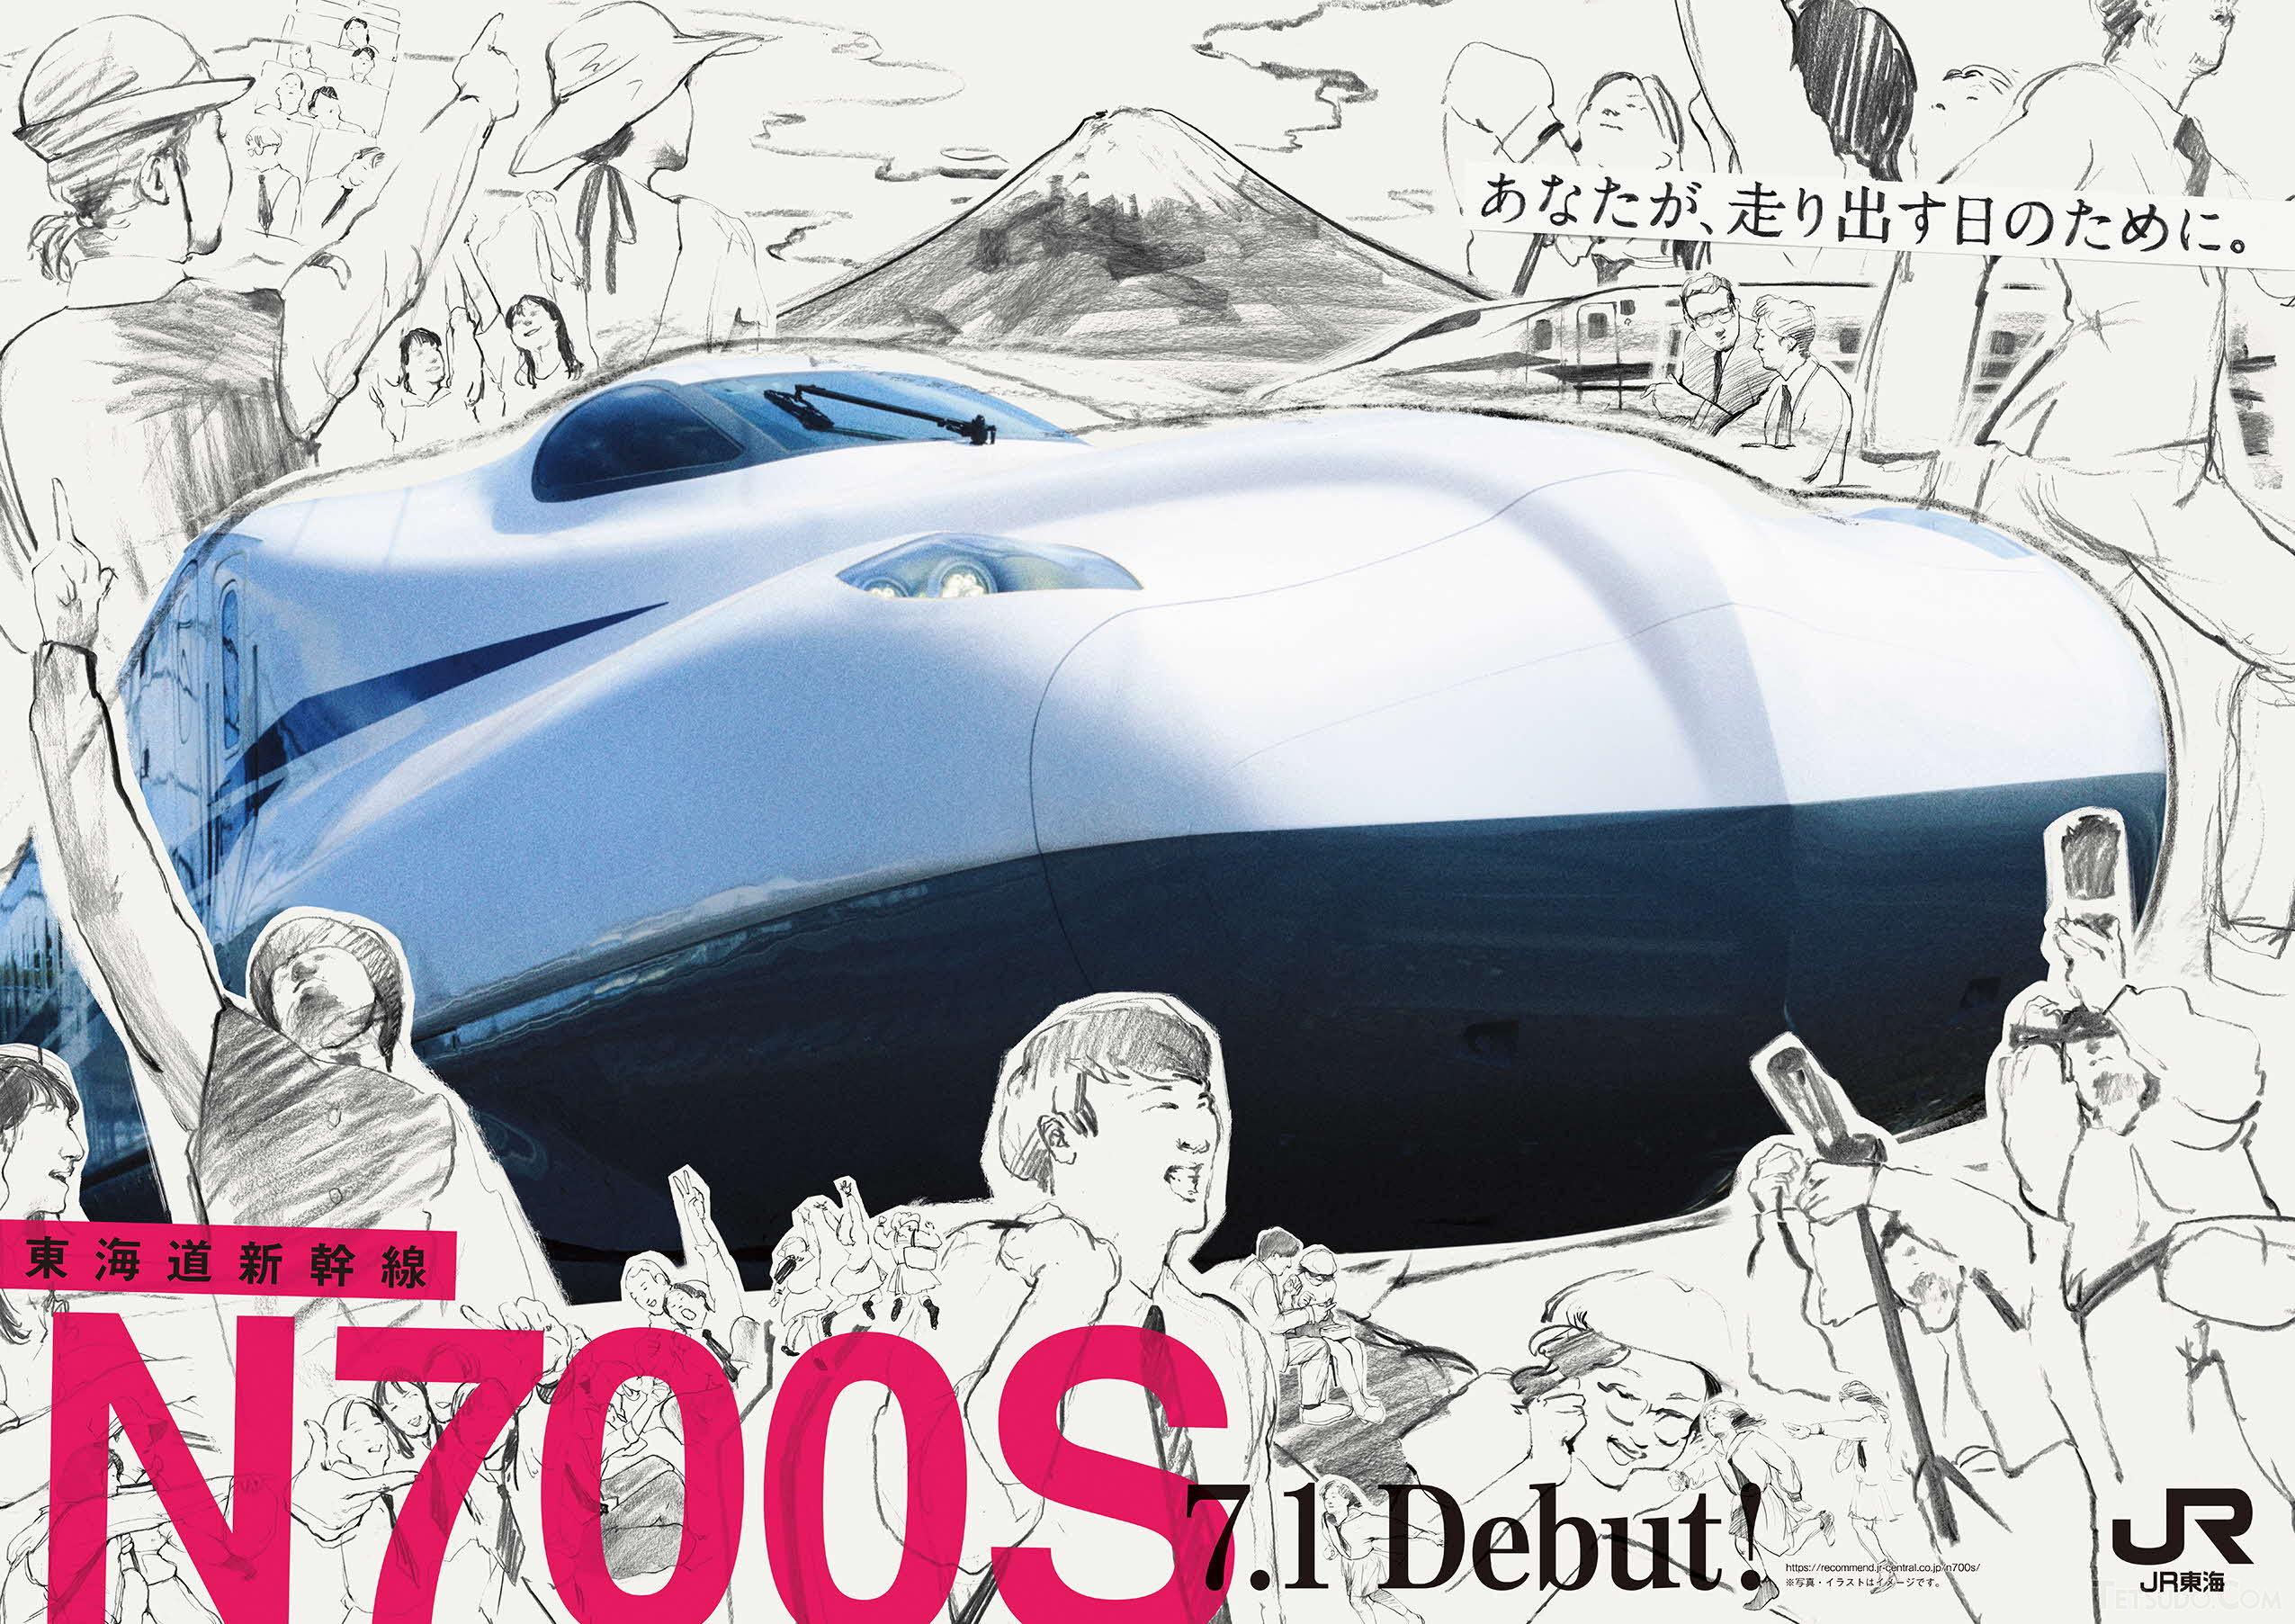 N700Sのデビュー告知ポスター(画像:JR東海)